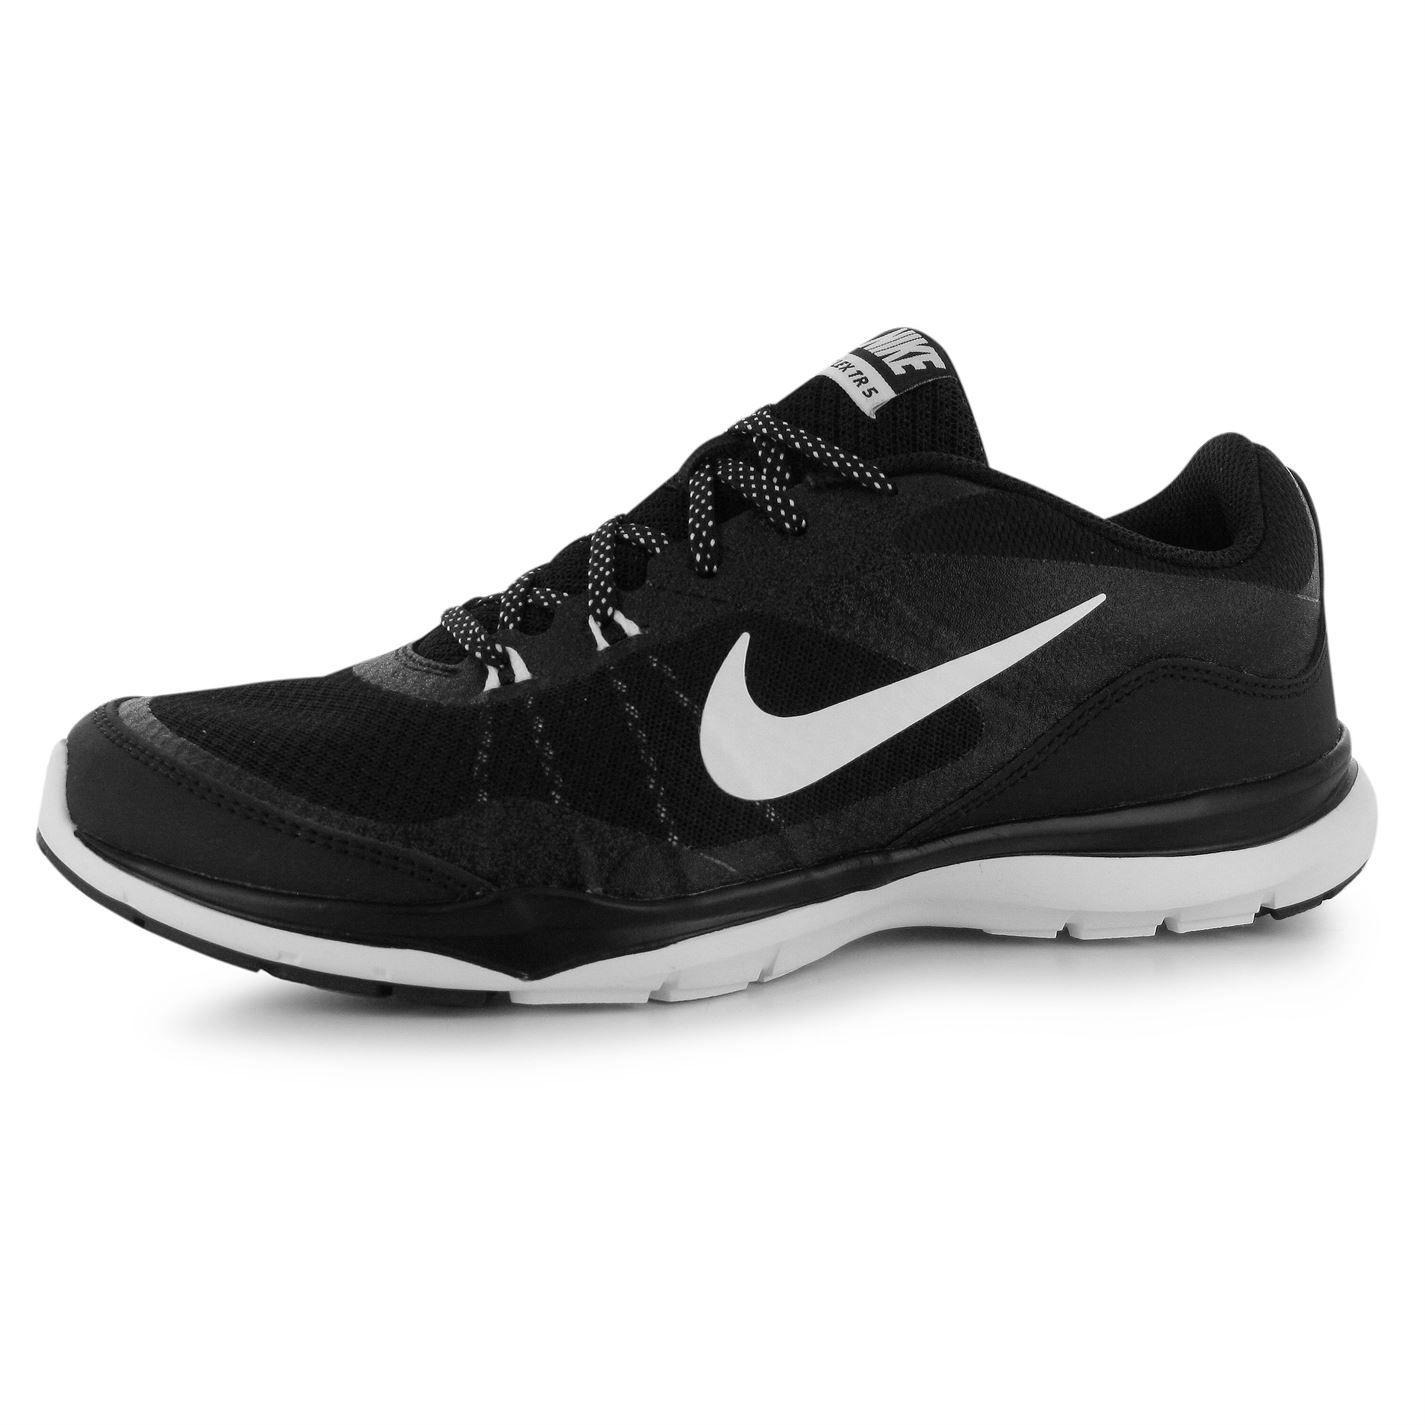 Girls Niketrainers Bobbydaleearnhardt.com